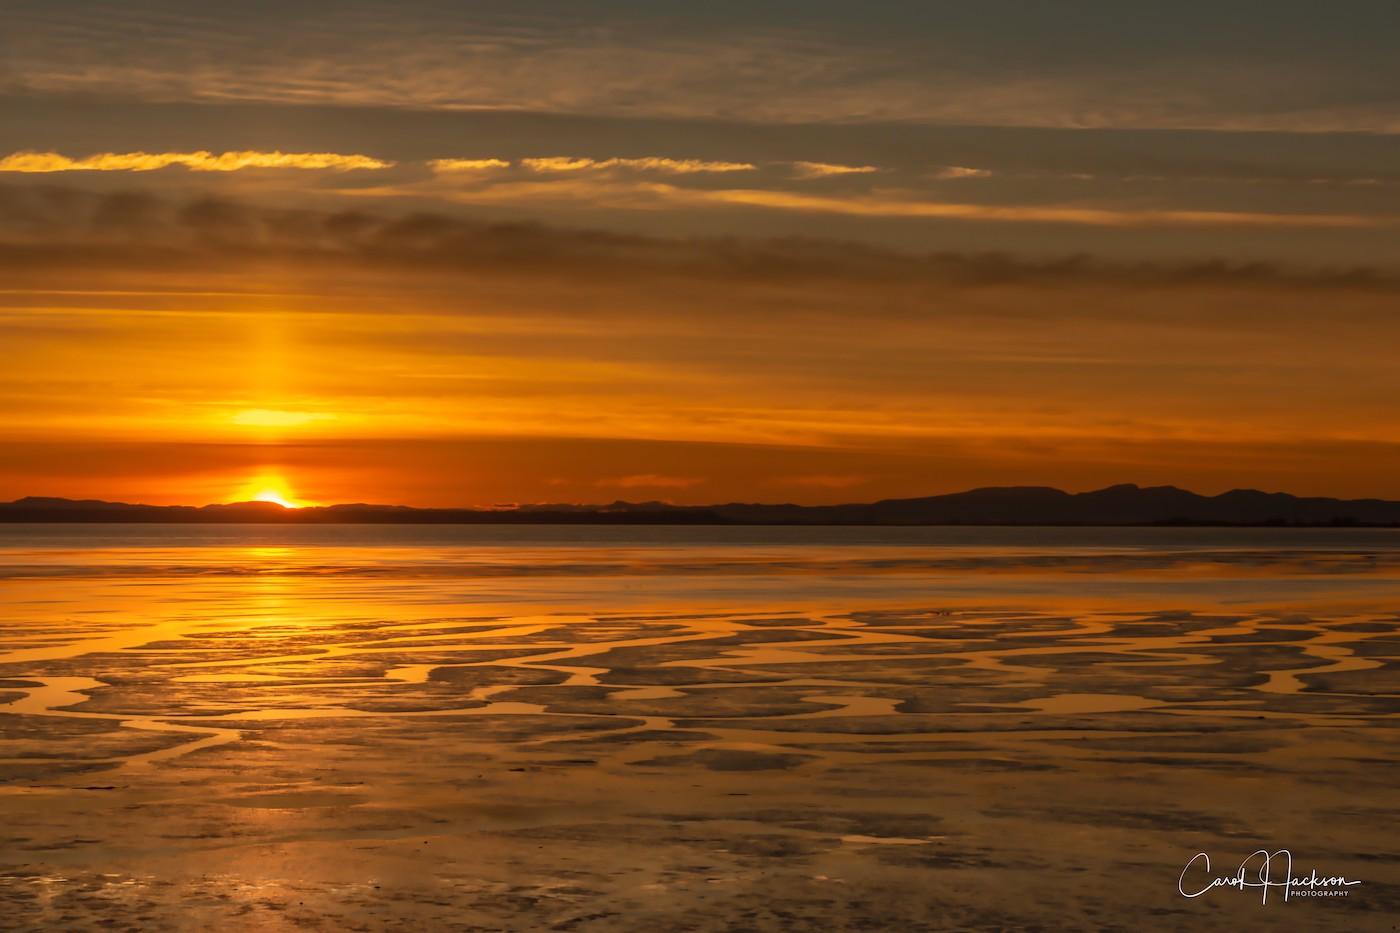 Mud Bay Sunset-CJJ